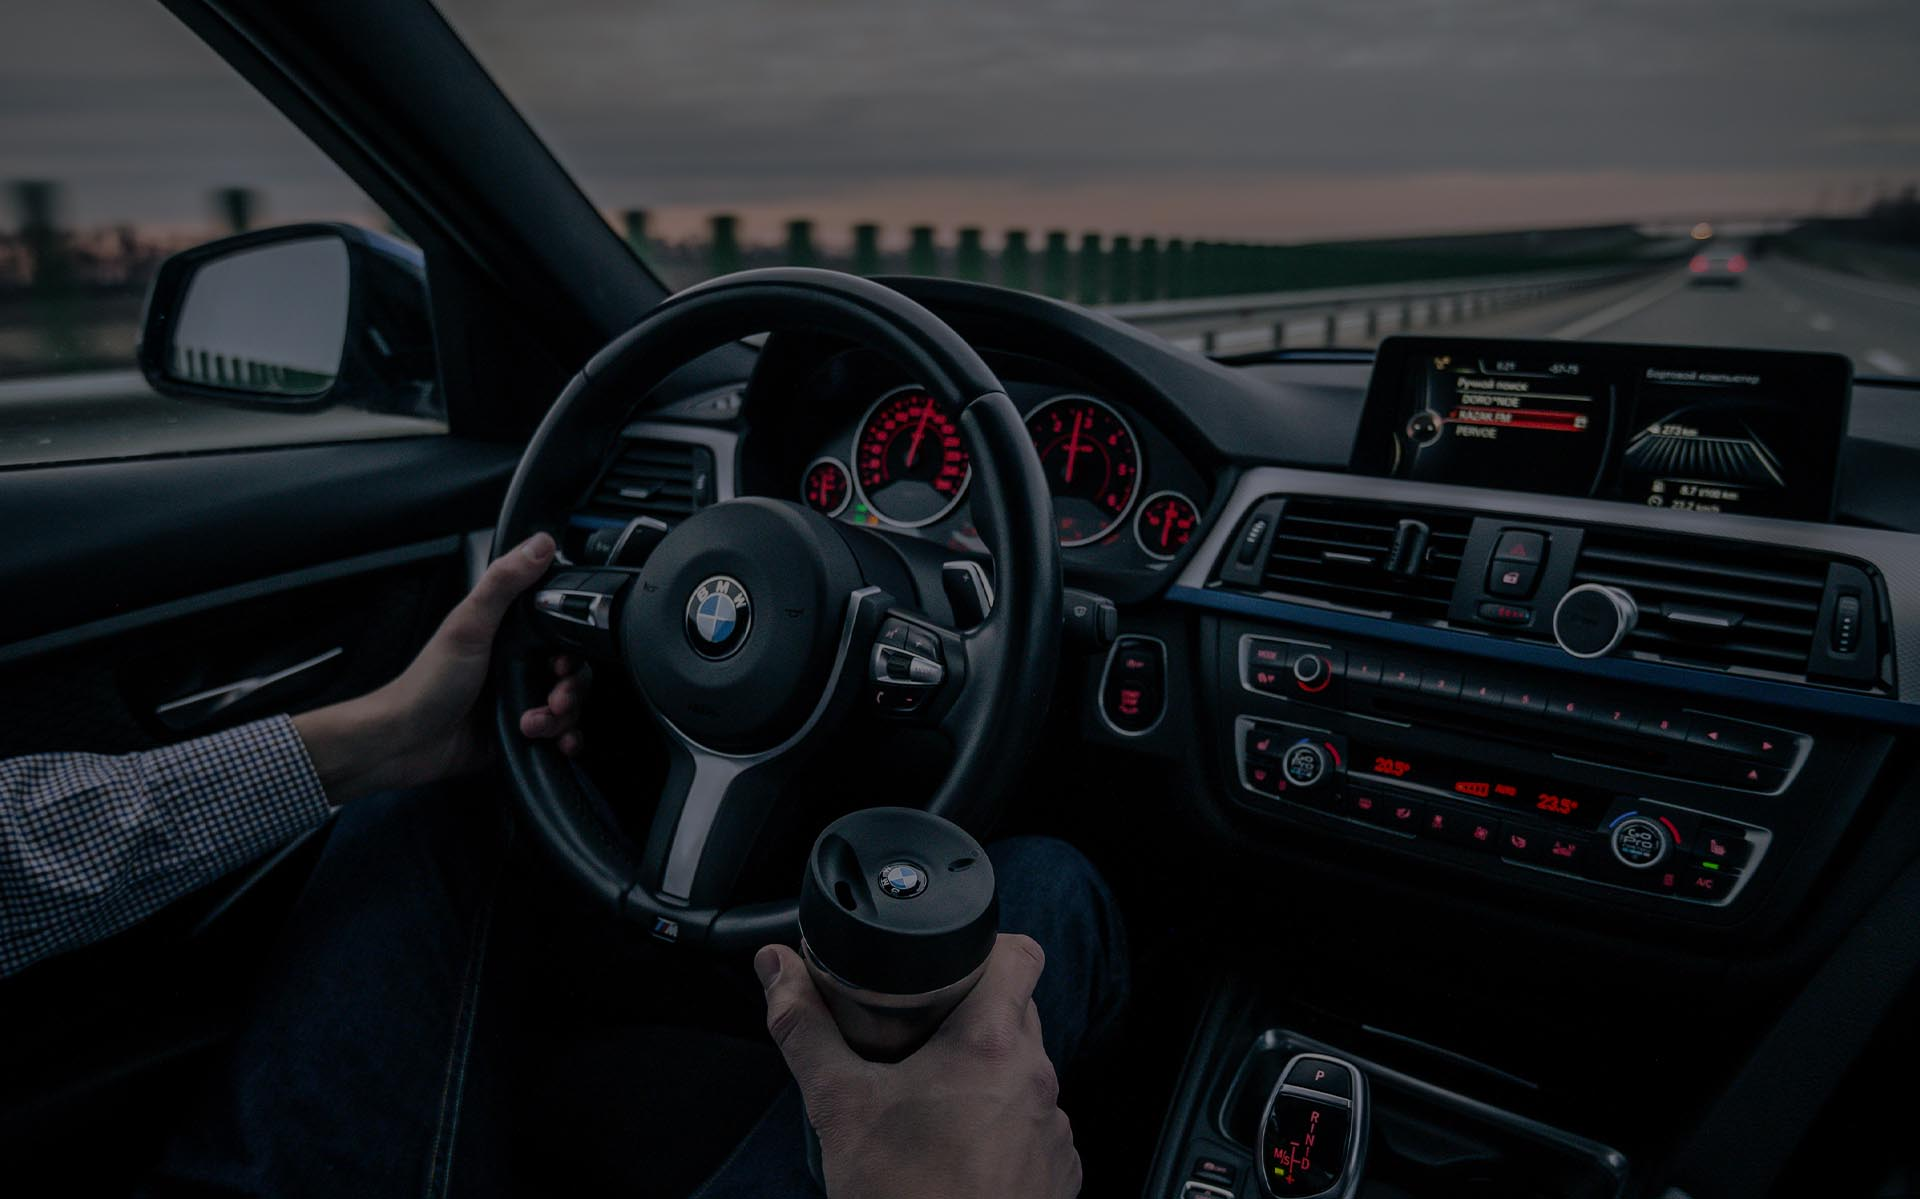 Onbezorgd BMW en MINI rijden